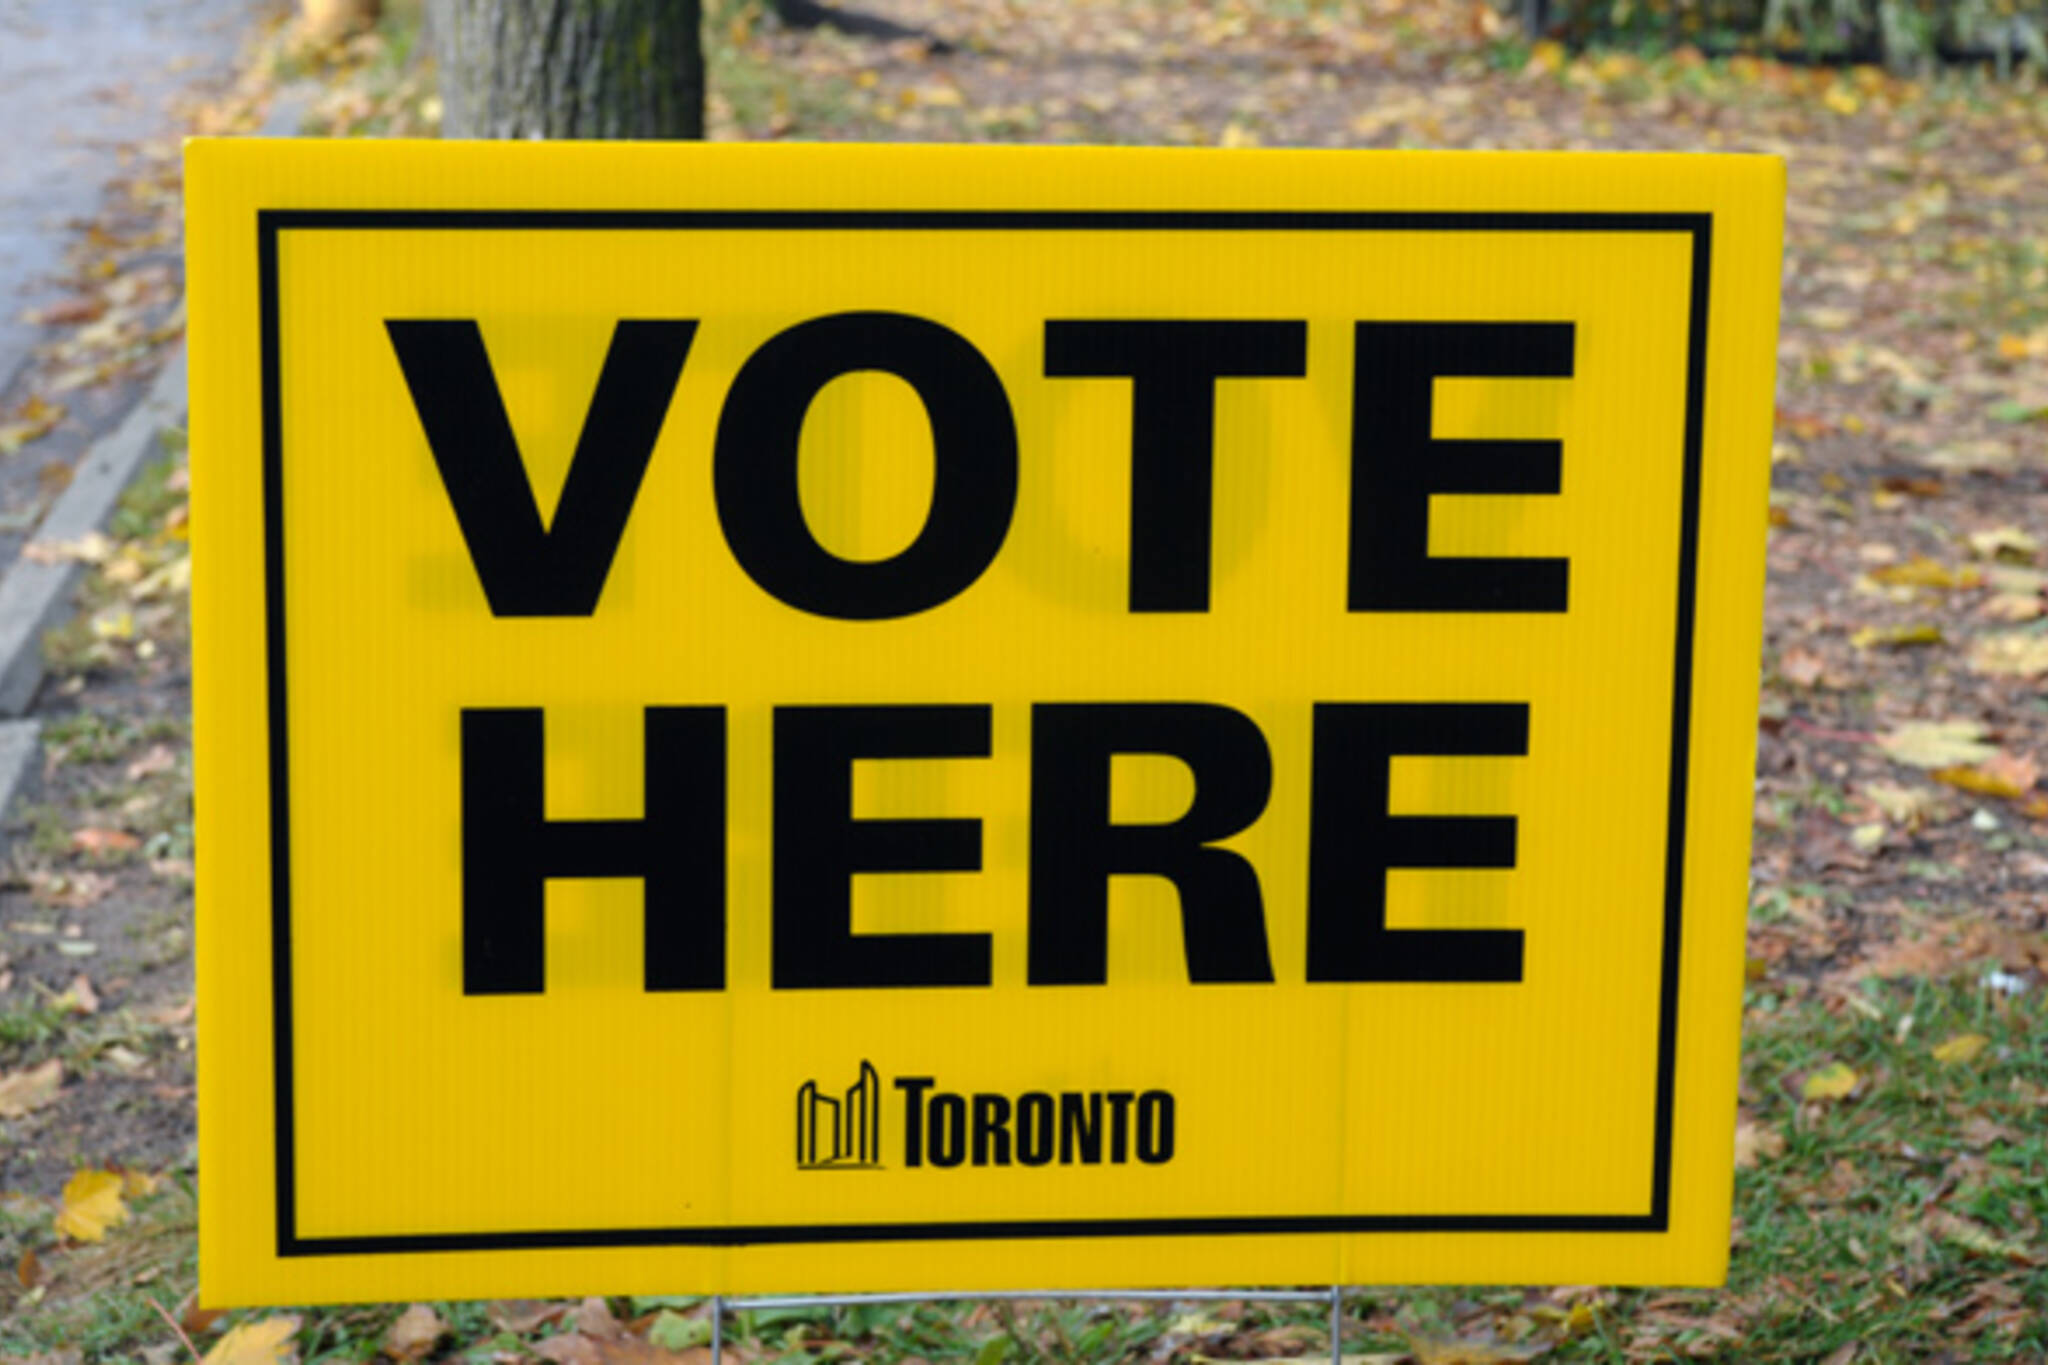 Toronto Election 2010 Results